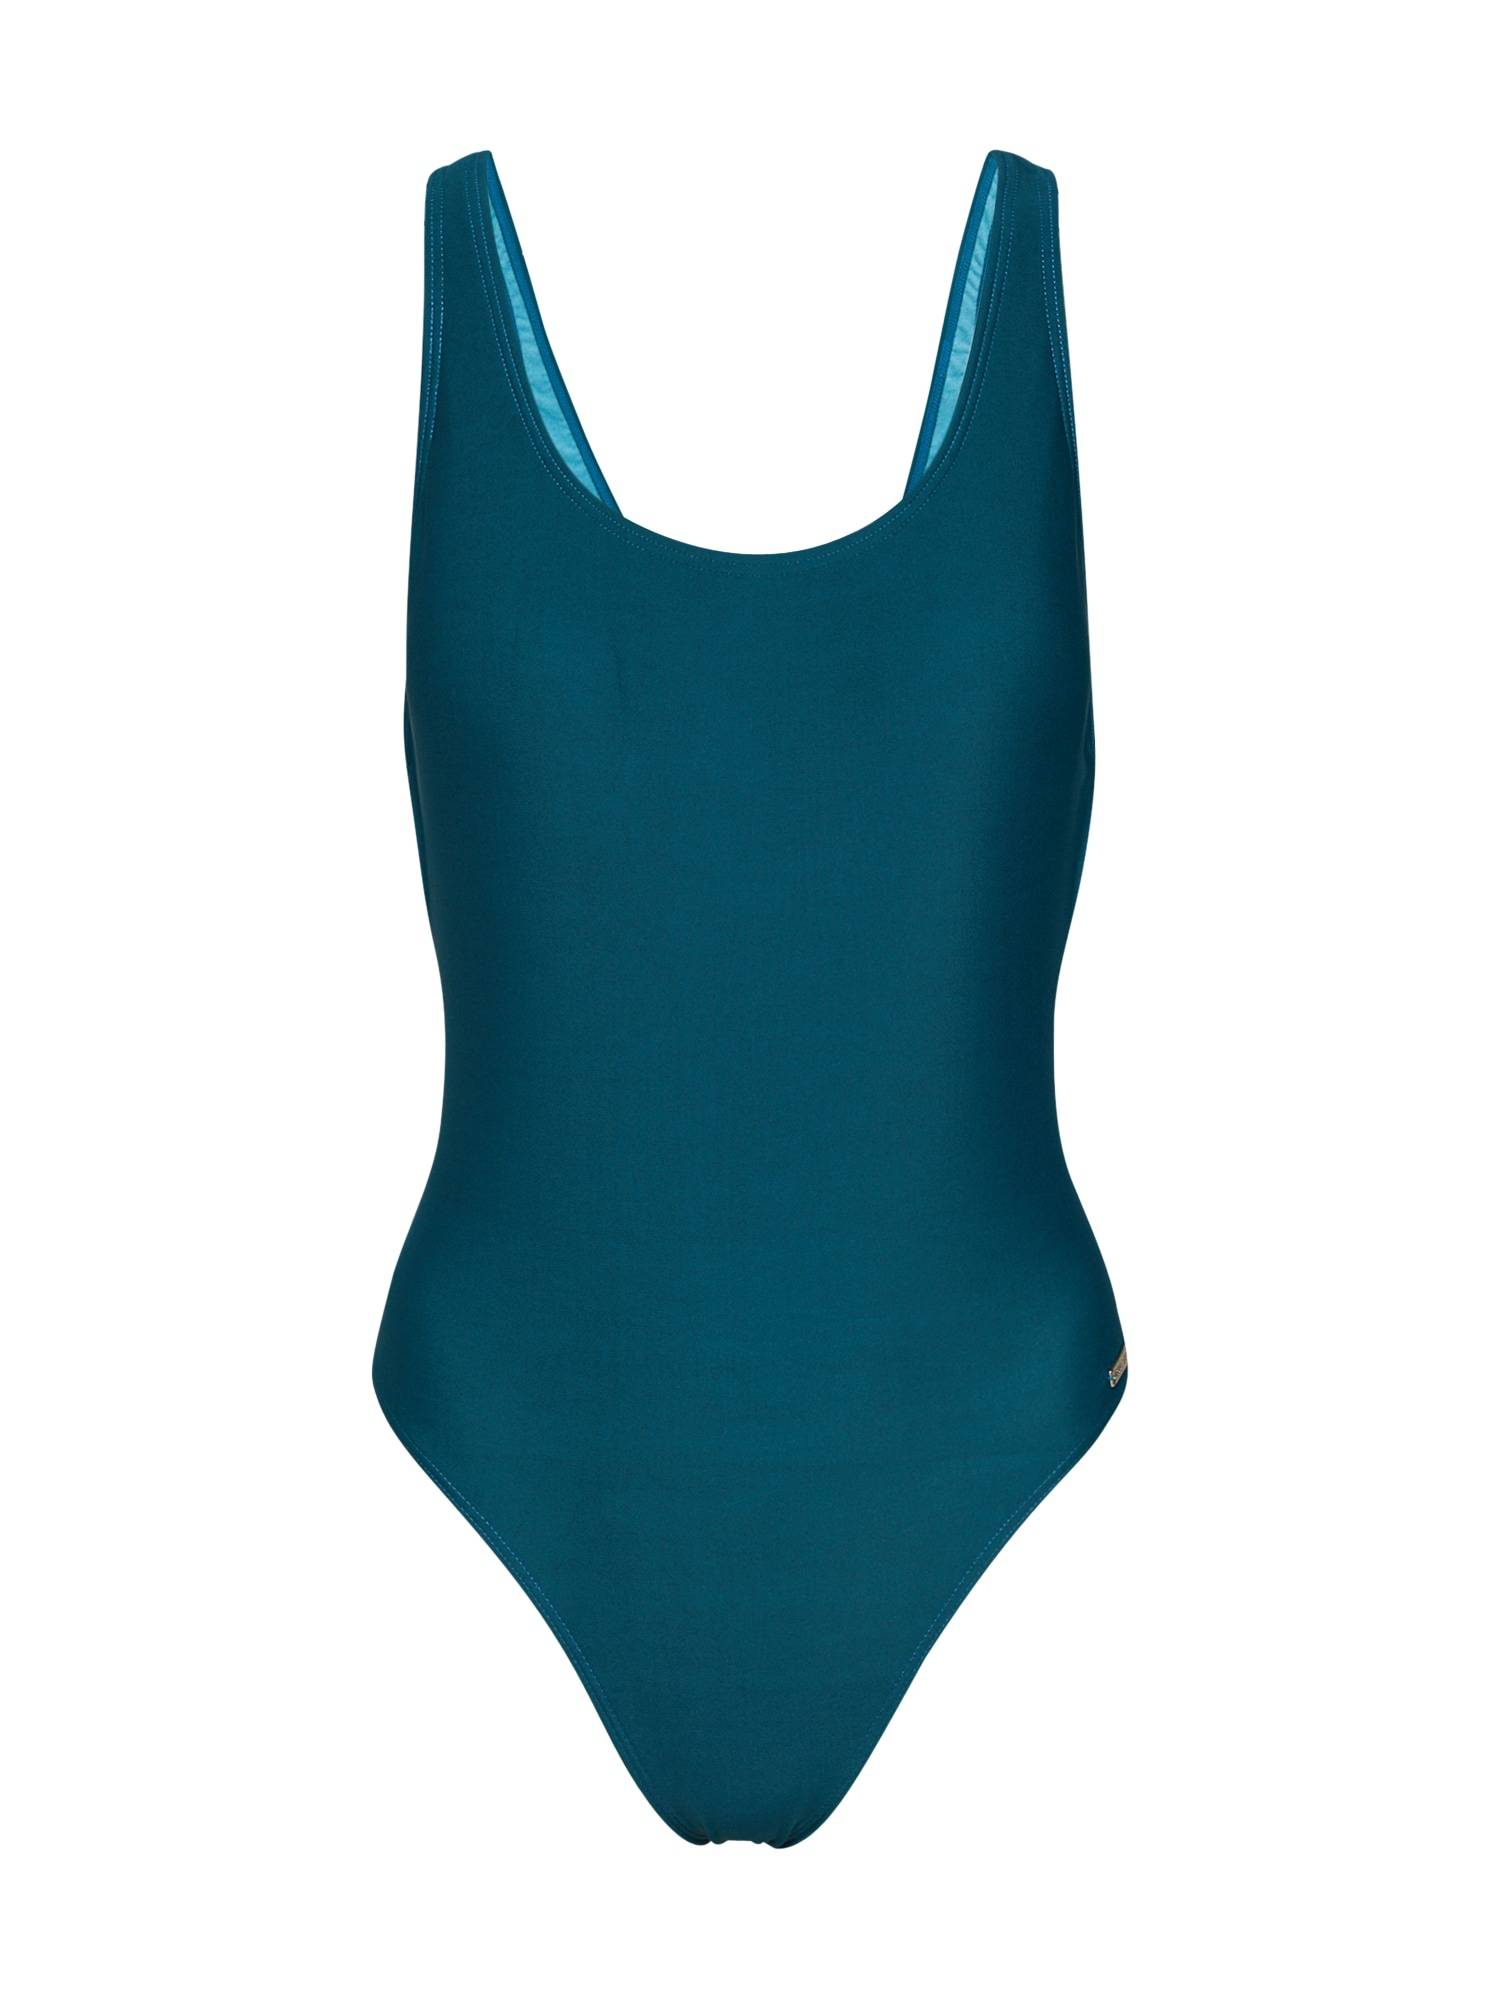 ABOUT YOU Maillot de bain 'Celia'  - Vert - Taille: 34 - female